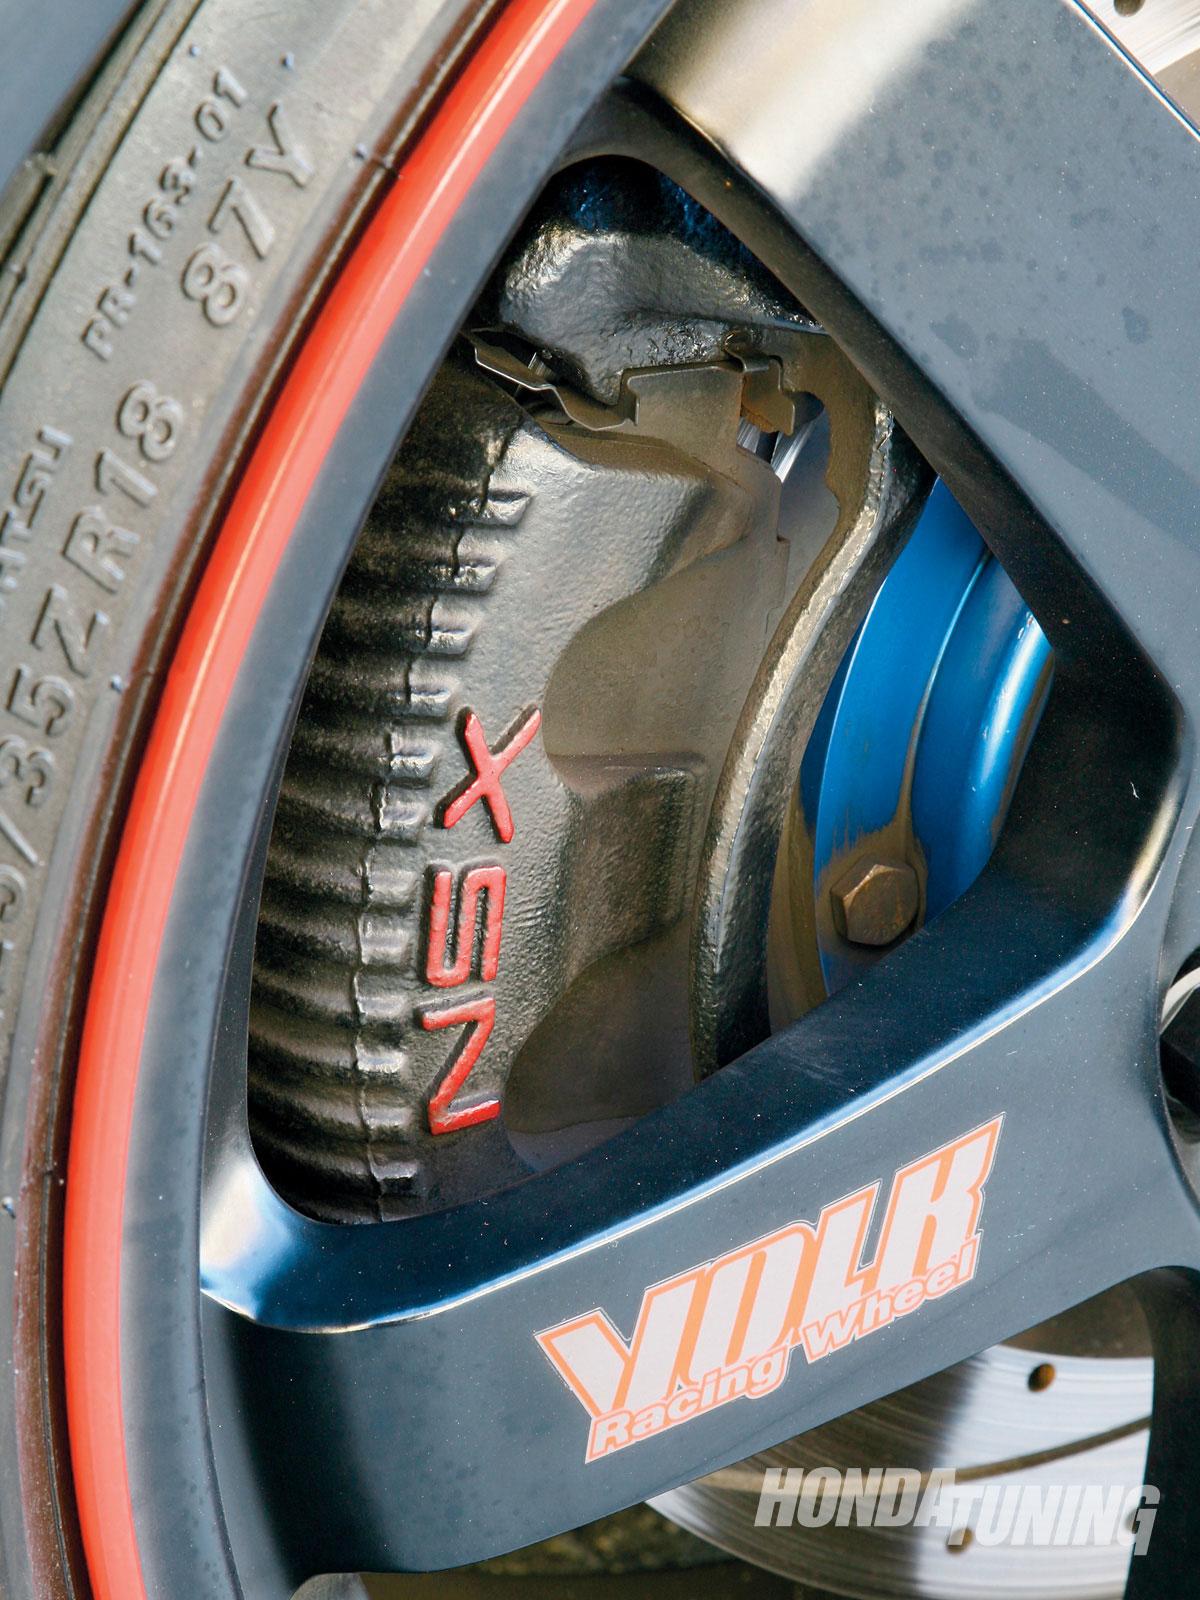 htup-0907-07-o 1999-honda-prelude NSX-caliper